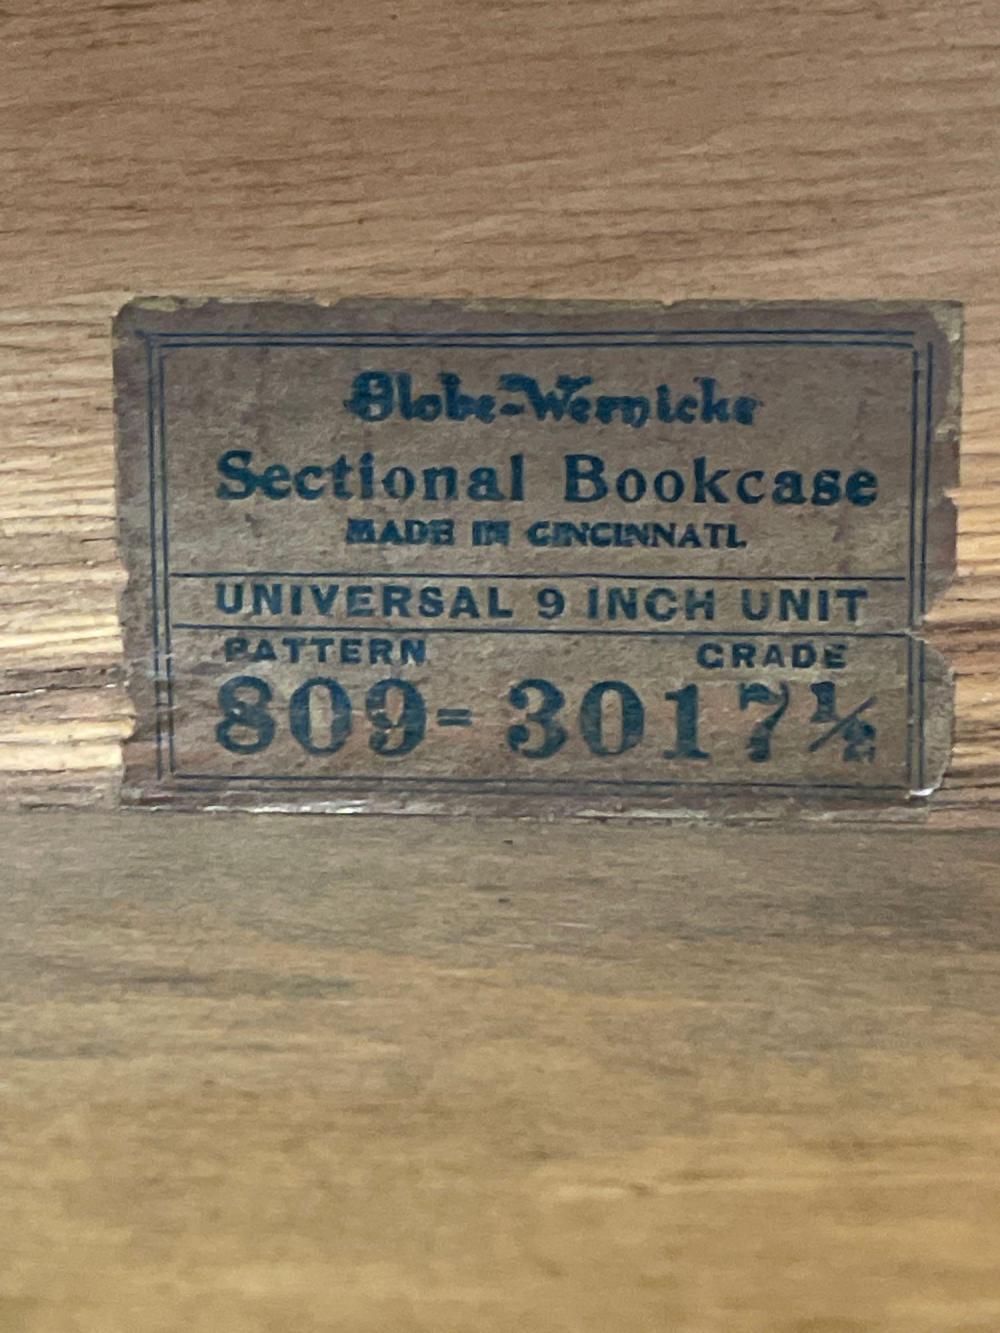 American Globe-Wernicke Six Stack Lawyers Bookcase